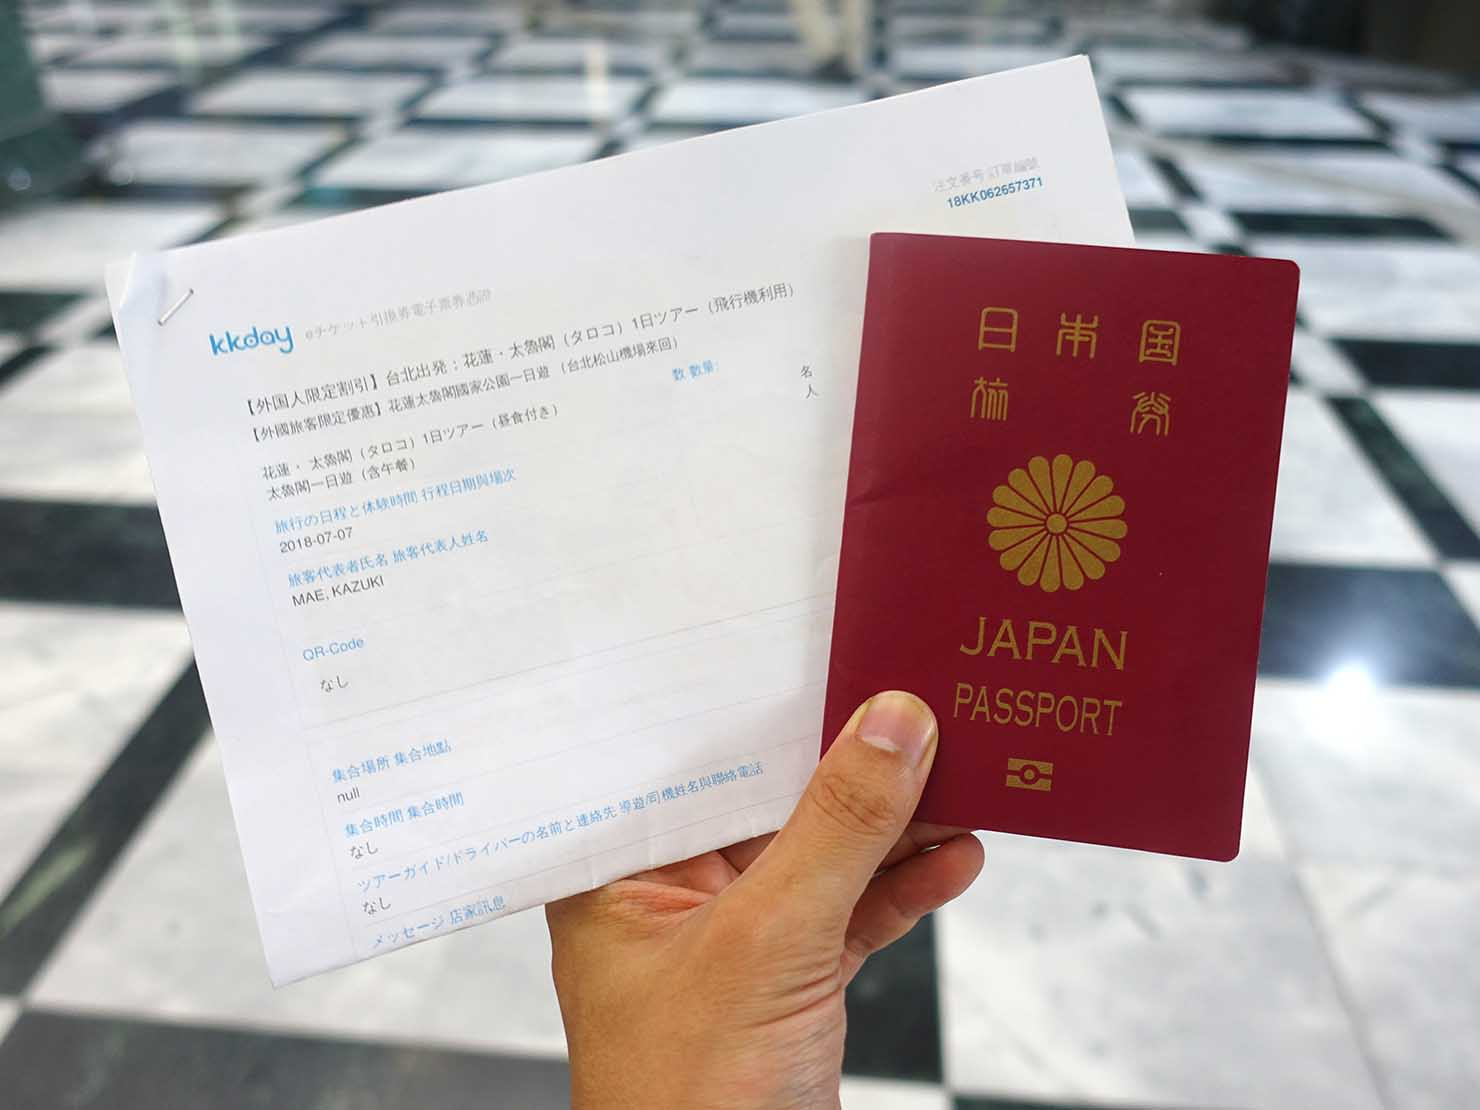 KKday外国人限定「花蓮・太魯閣(タロコ)日帰りツアー」花蓮空港で提出するもの